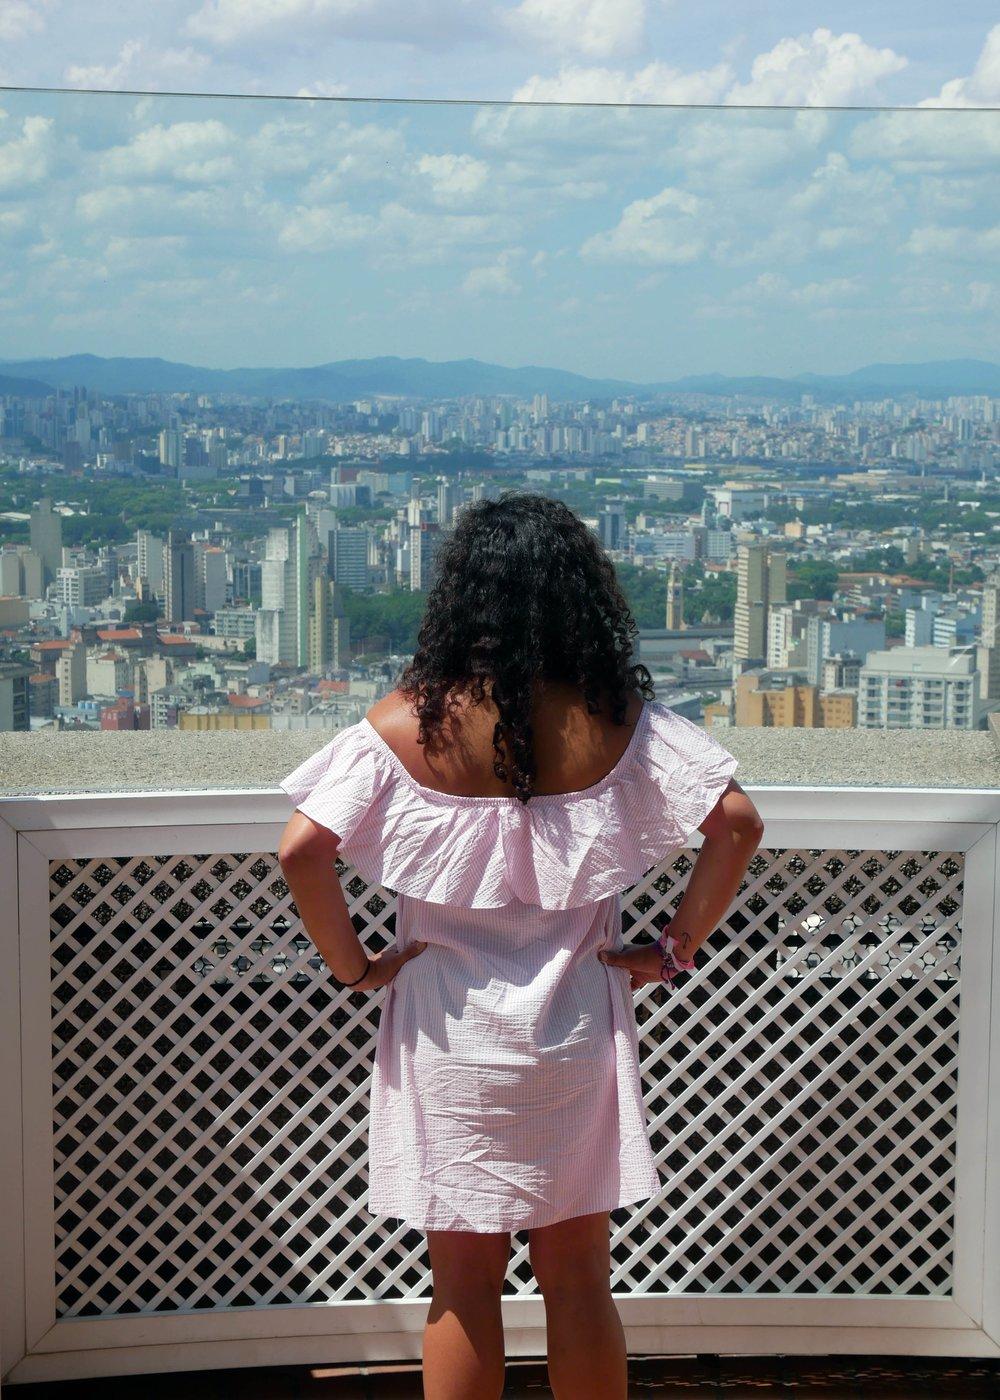 São Paulo city views